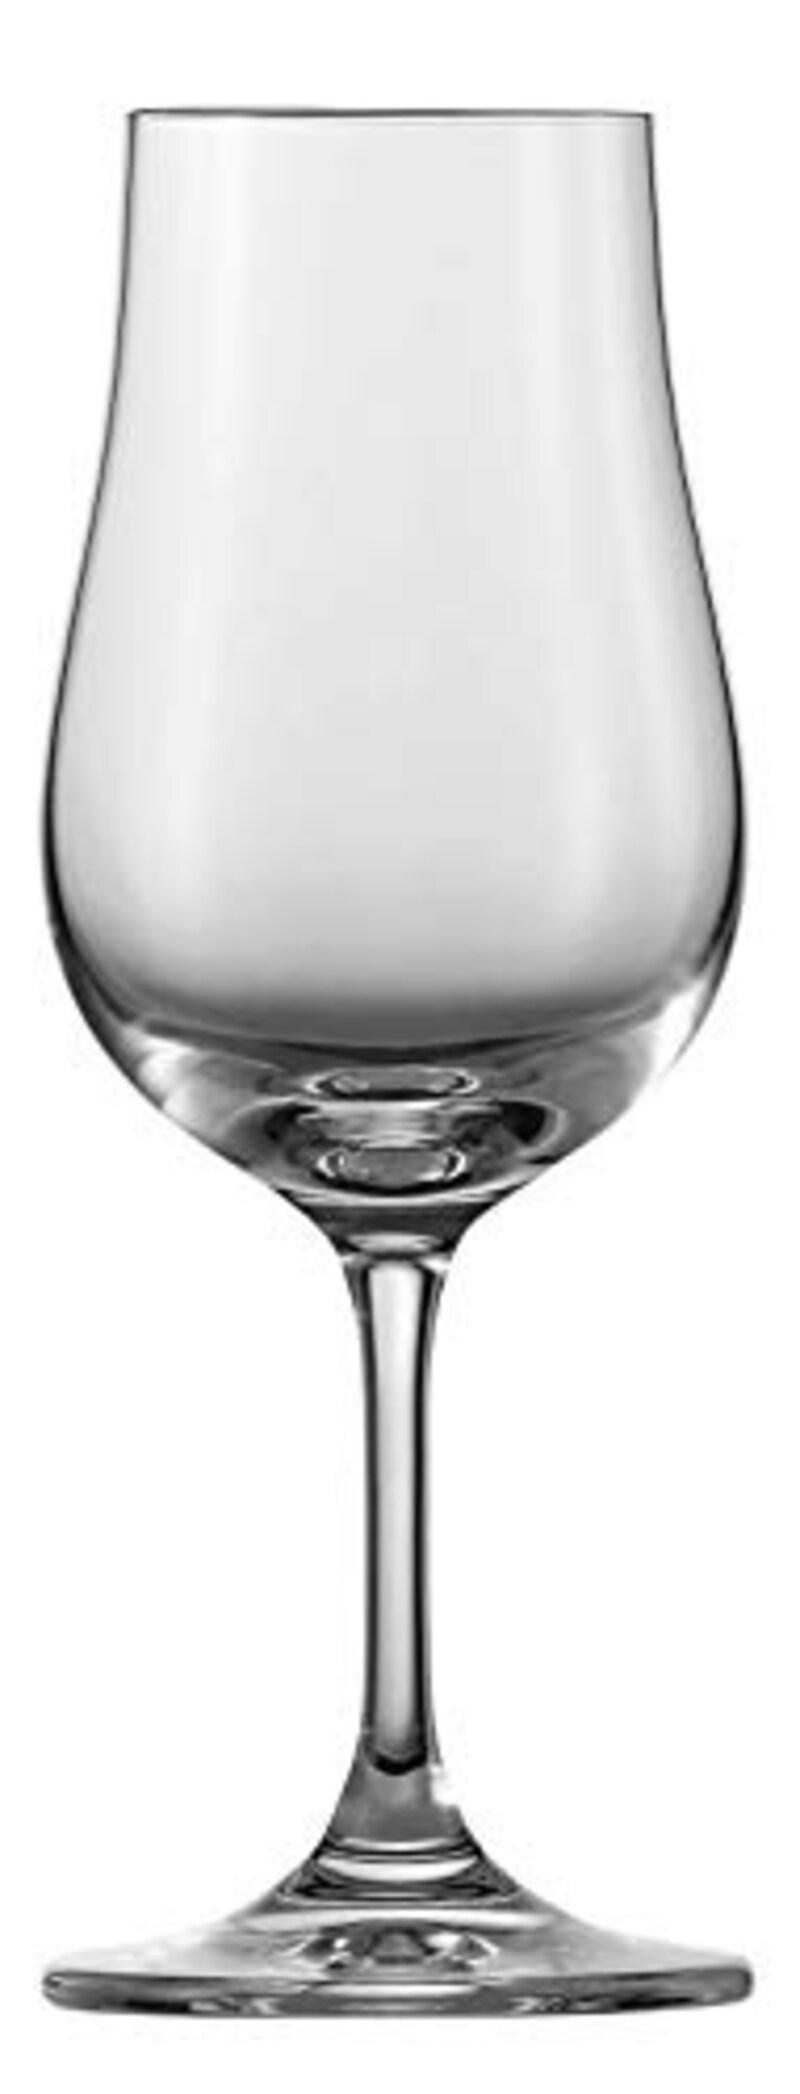 SCHOTT ZWIESEL(ショットツヴィーゼル),バースペシャル ウイスキーグラス,116457